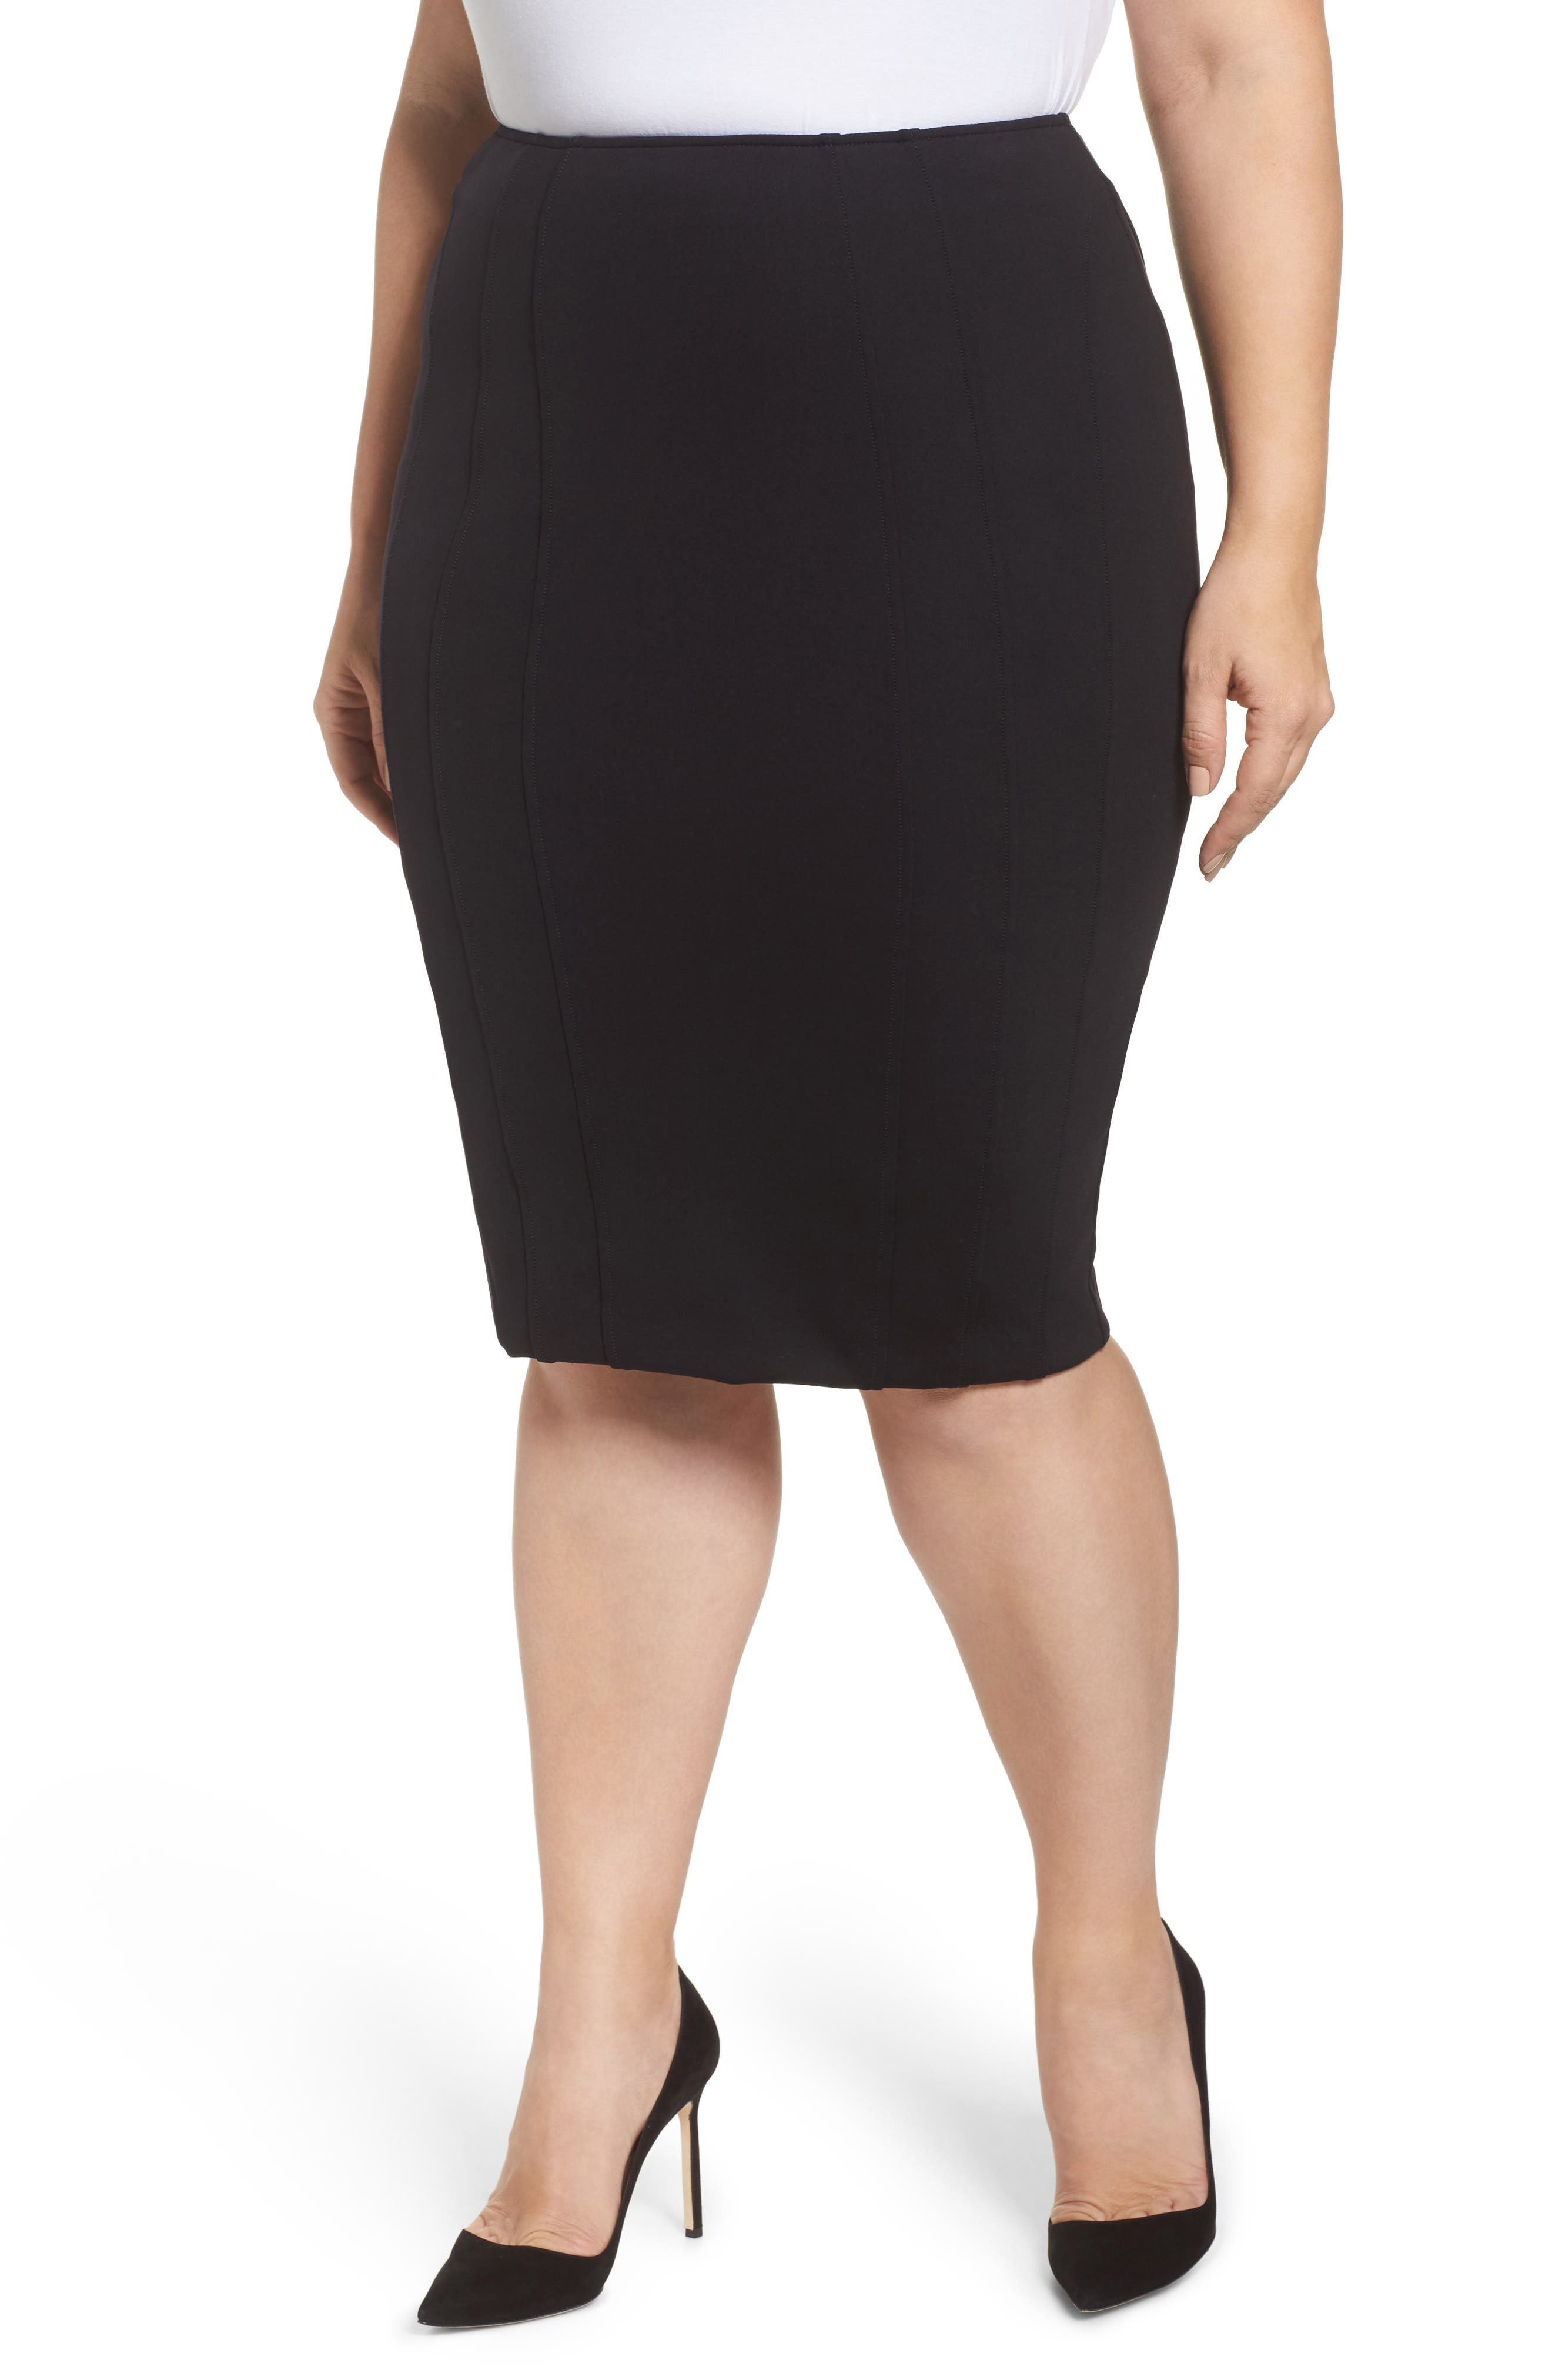 Ashley Graham x Marina Rinaldi Ocraceo Jersey Pencil Skirt (Regular & Plus Size)